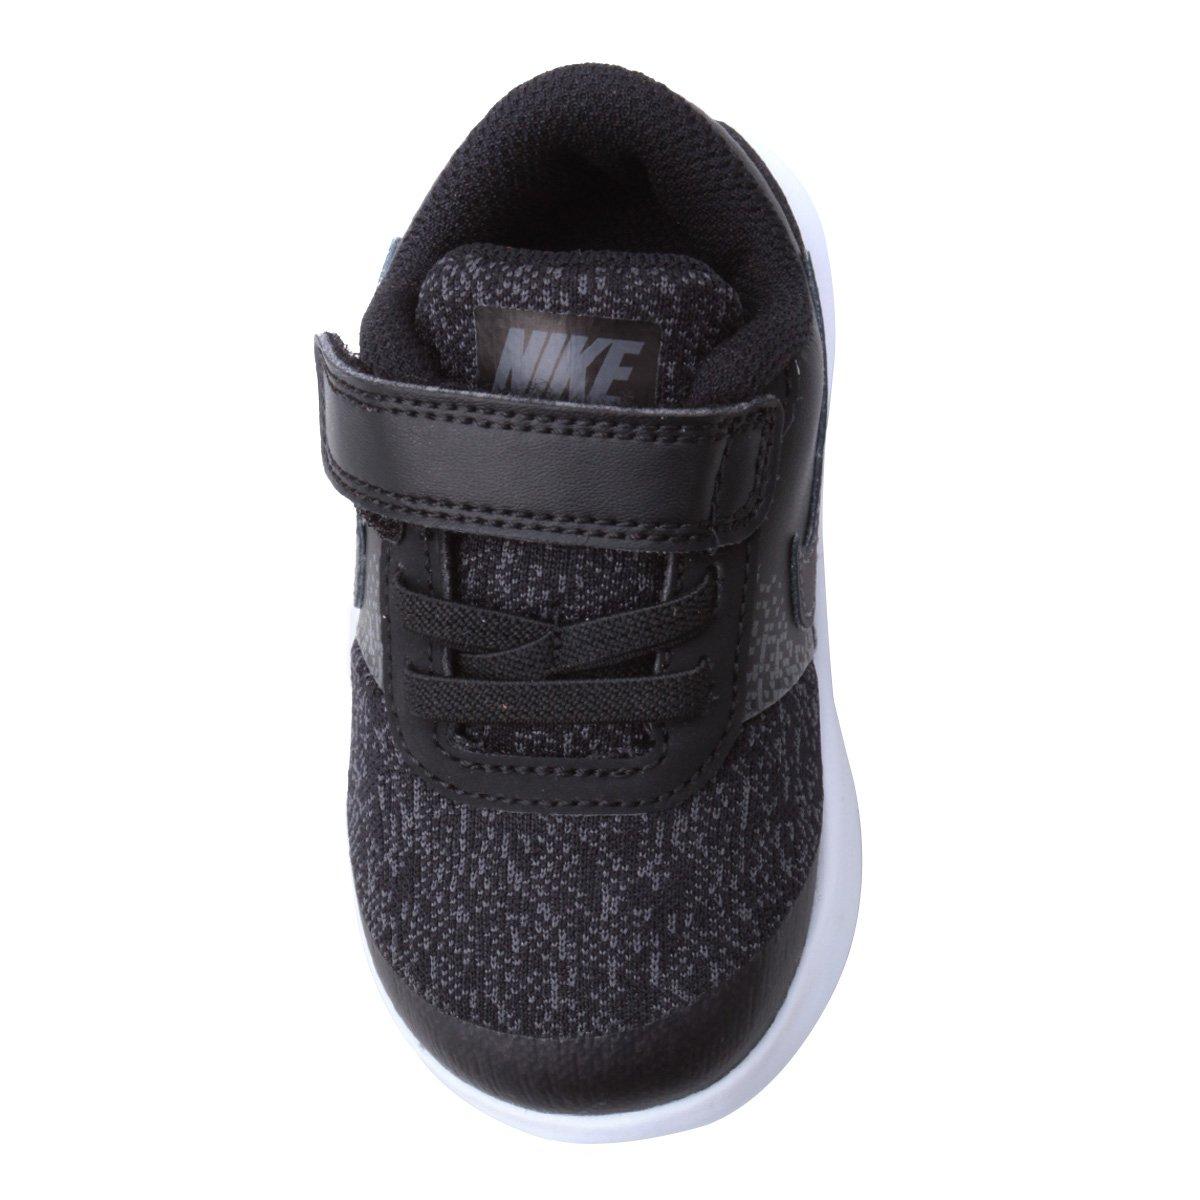 7d53c3cb54 Tênis Infantil Nike Flex Contact Masculino - Cinza e Preto - Compre ...